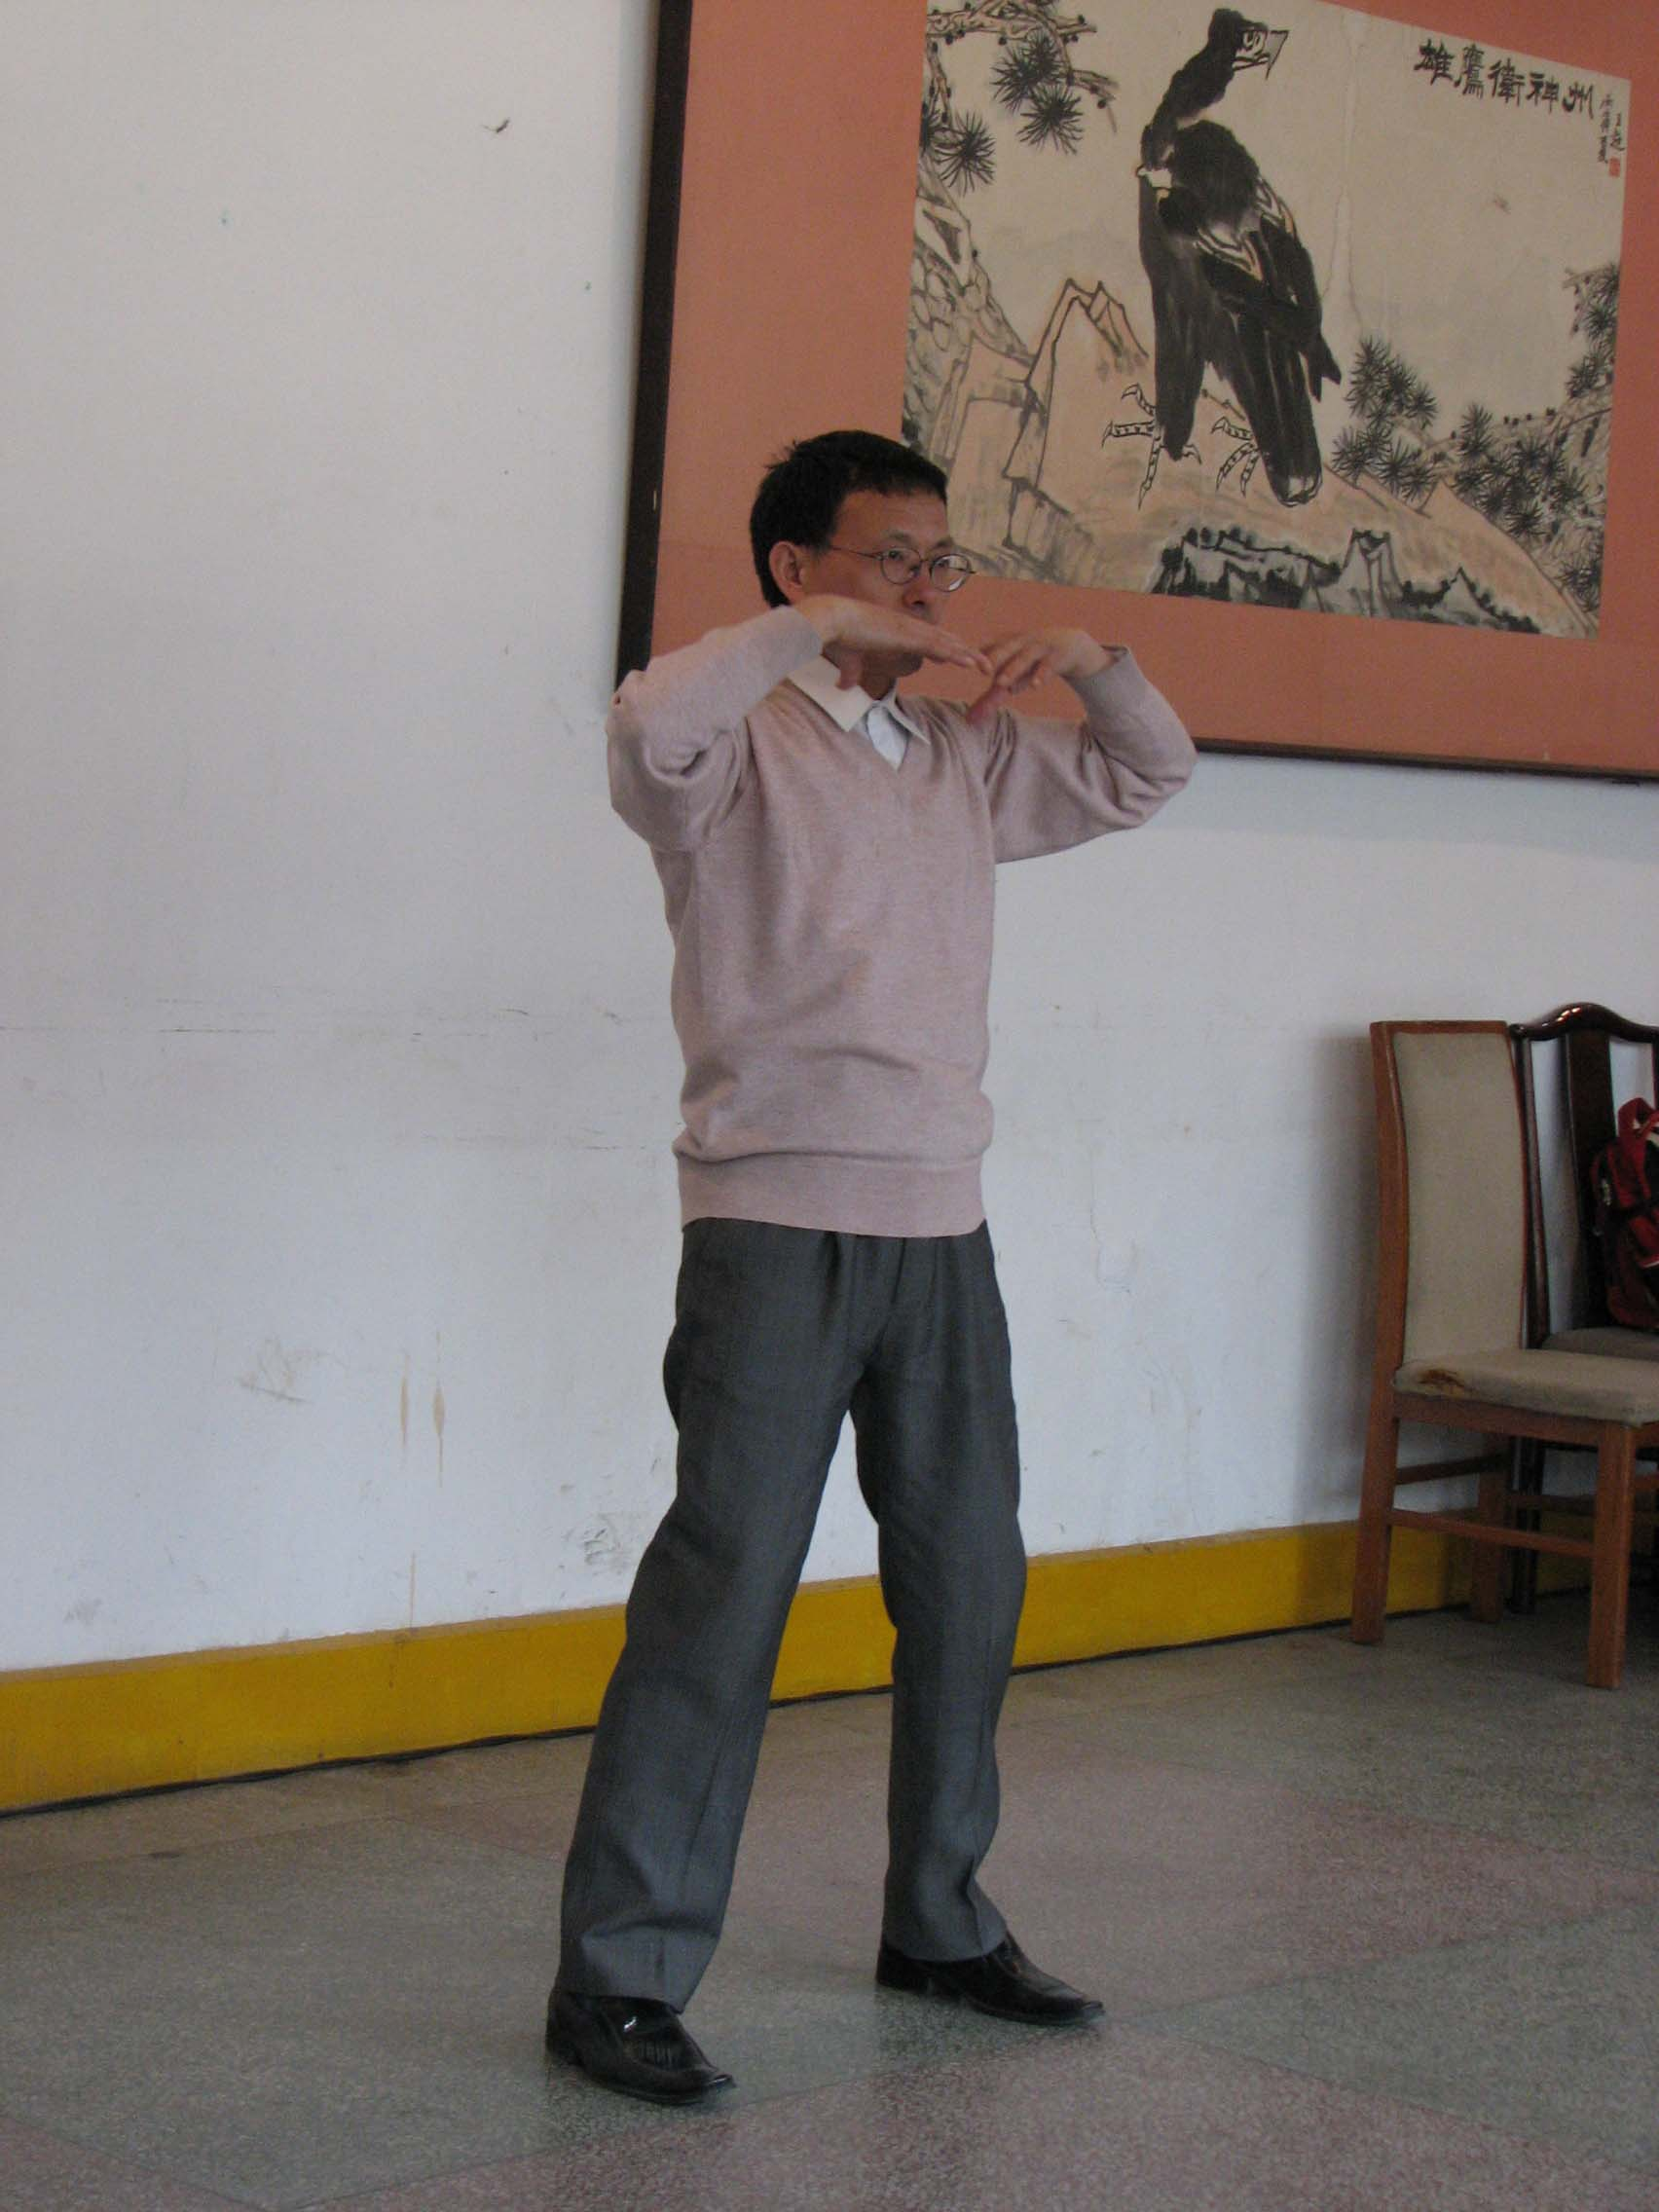 Inspiring Stories of Da Yan Wild Goose Qigong - Simon Blow